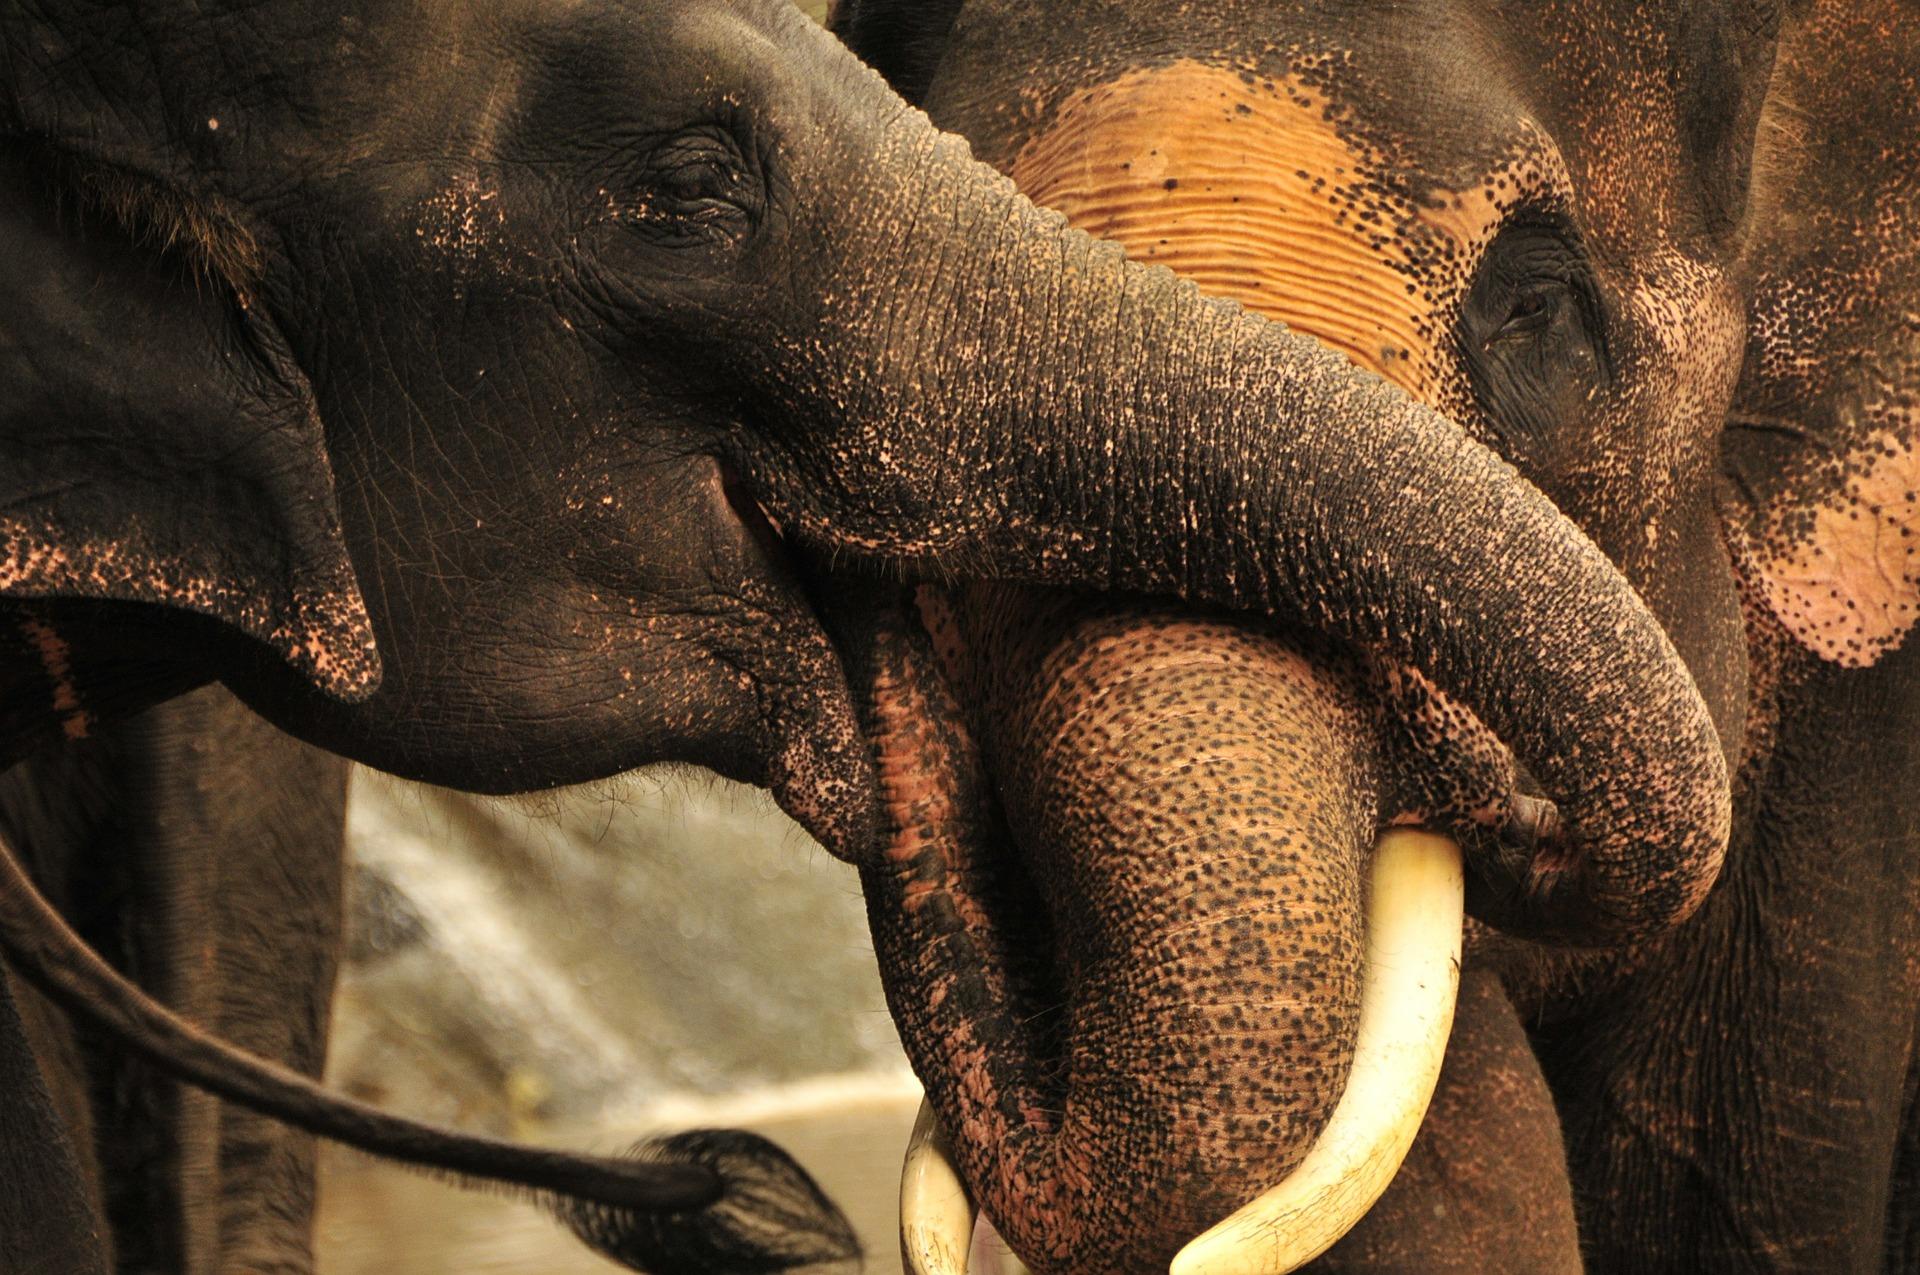 elephant-385268_1920